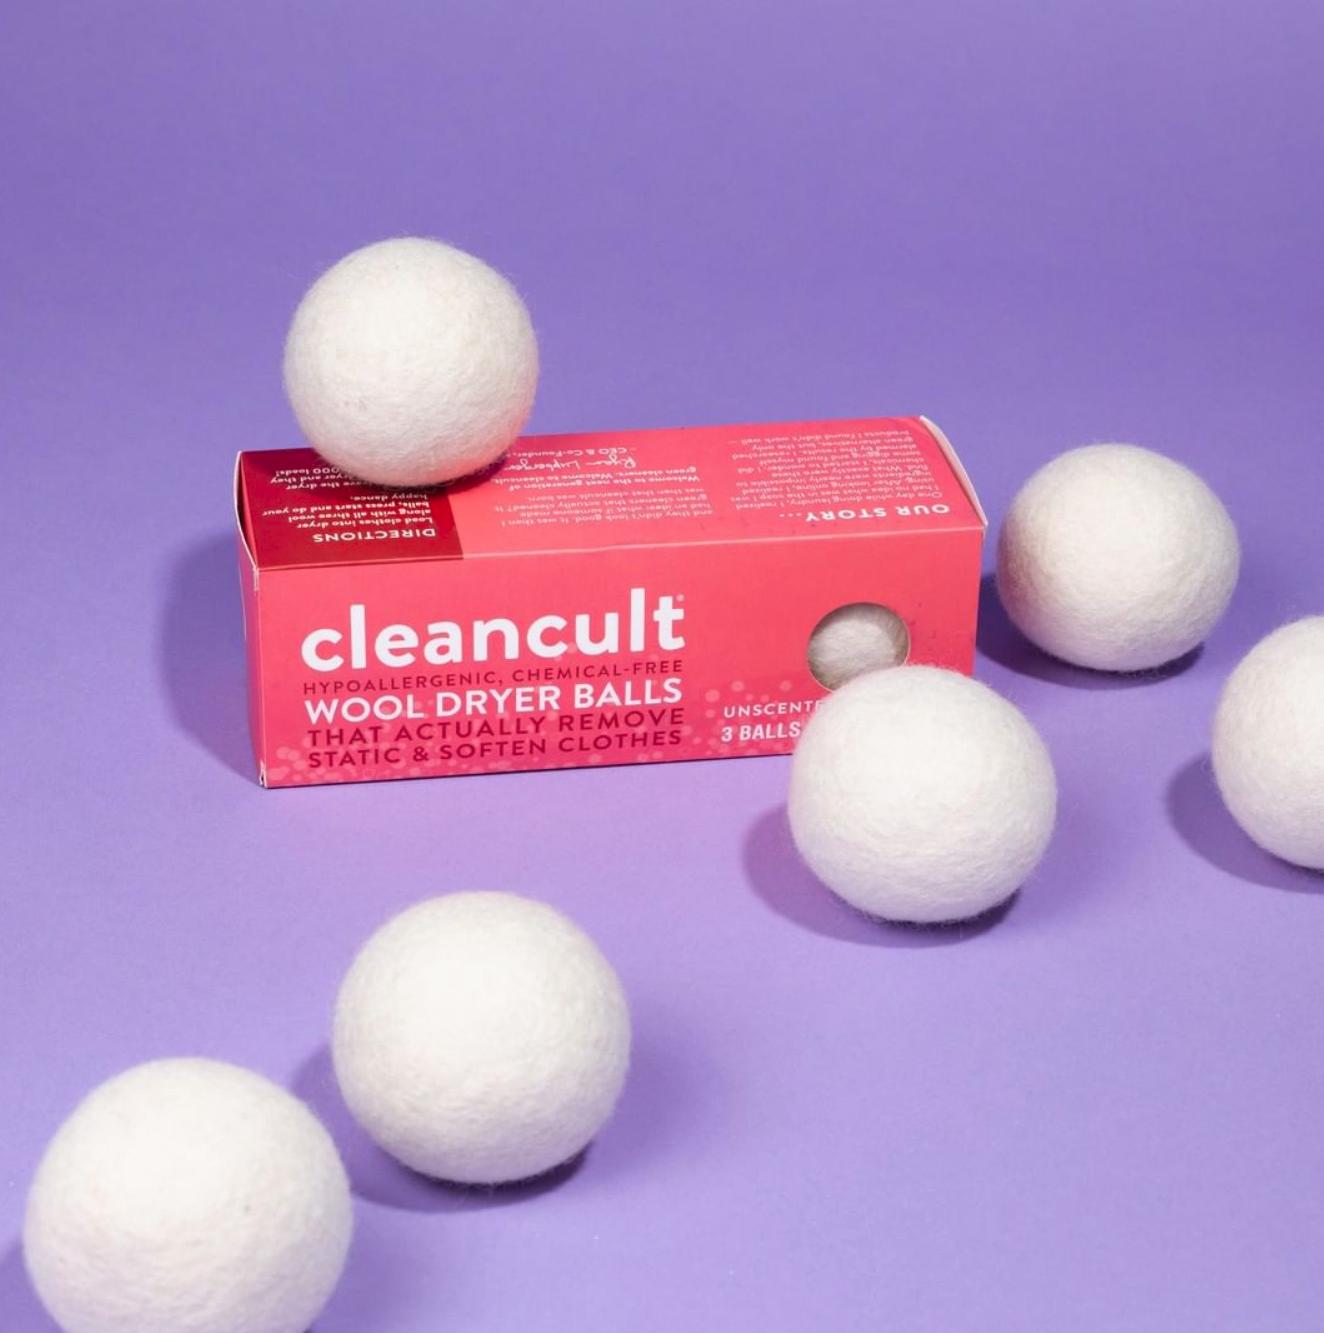 cleancultdryerballs.png